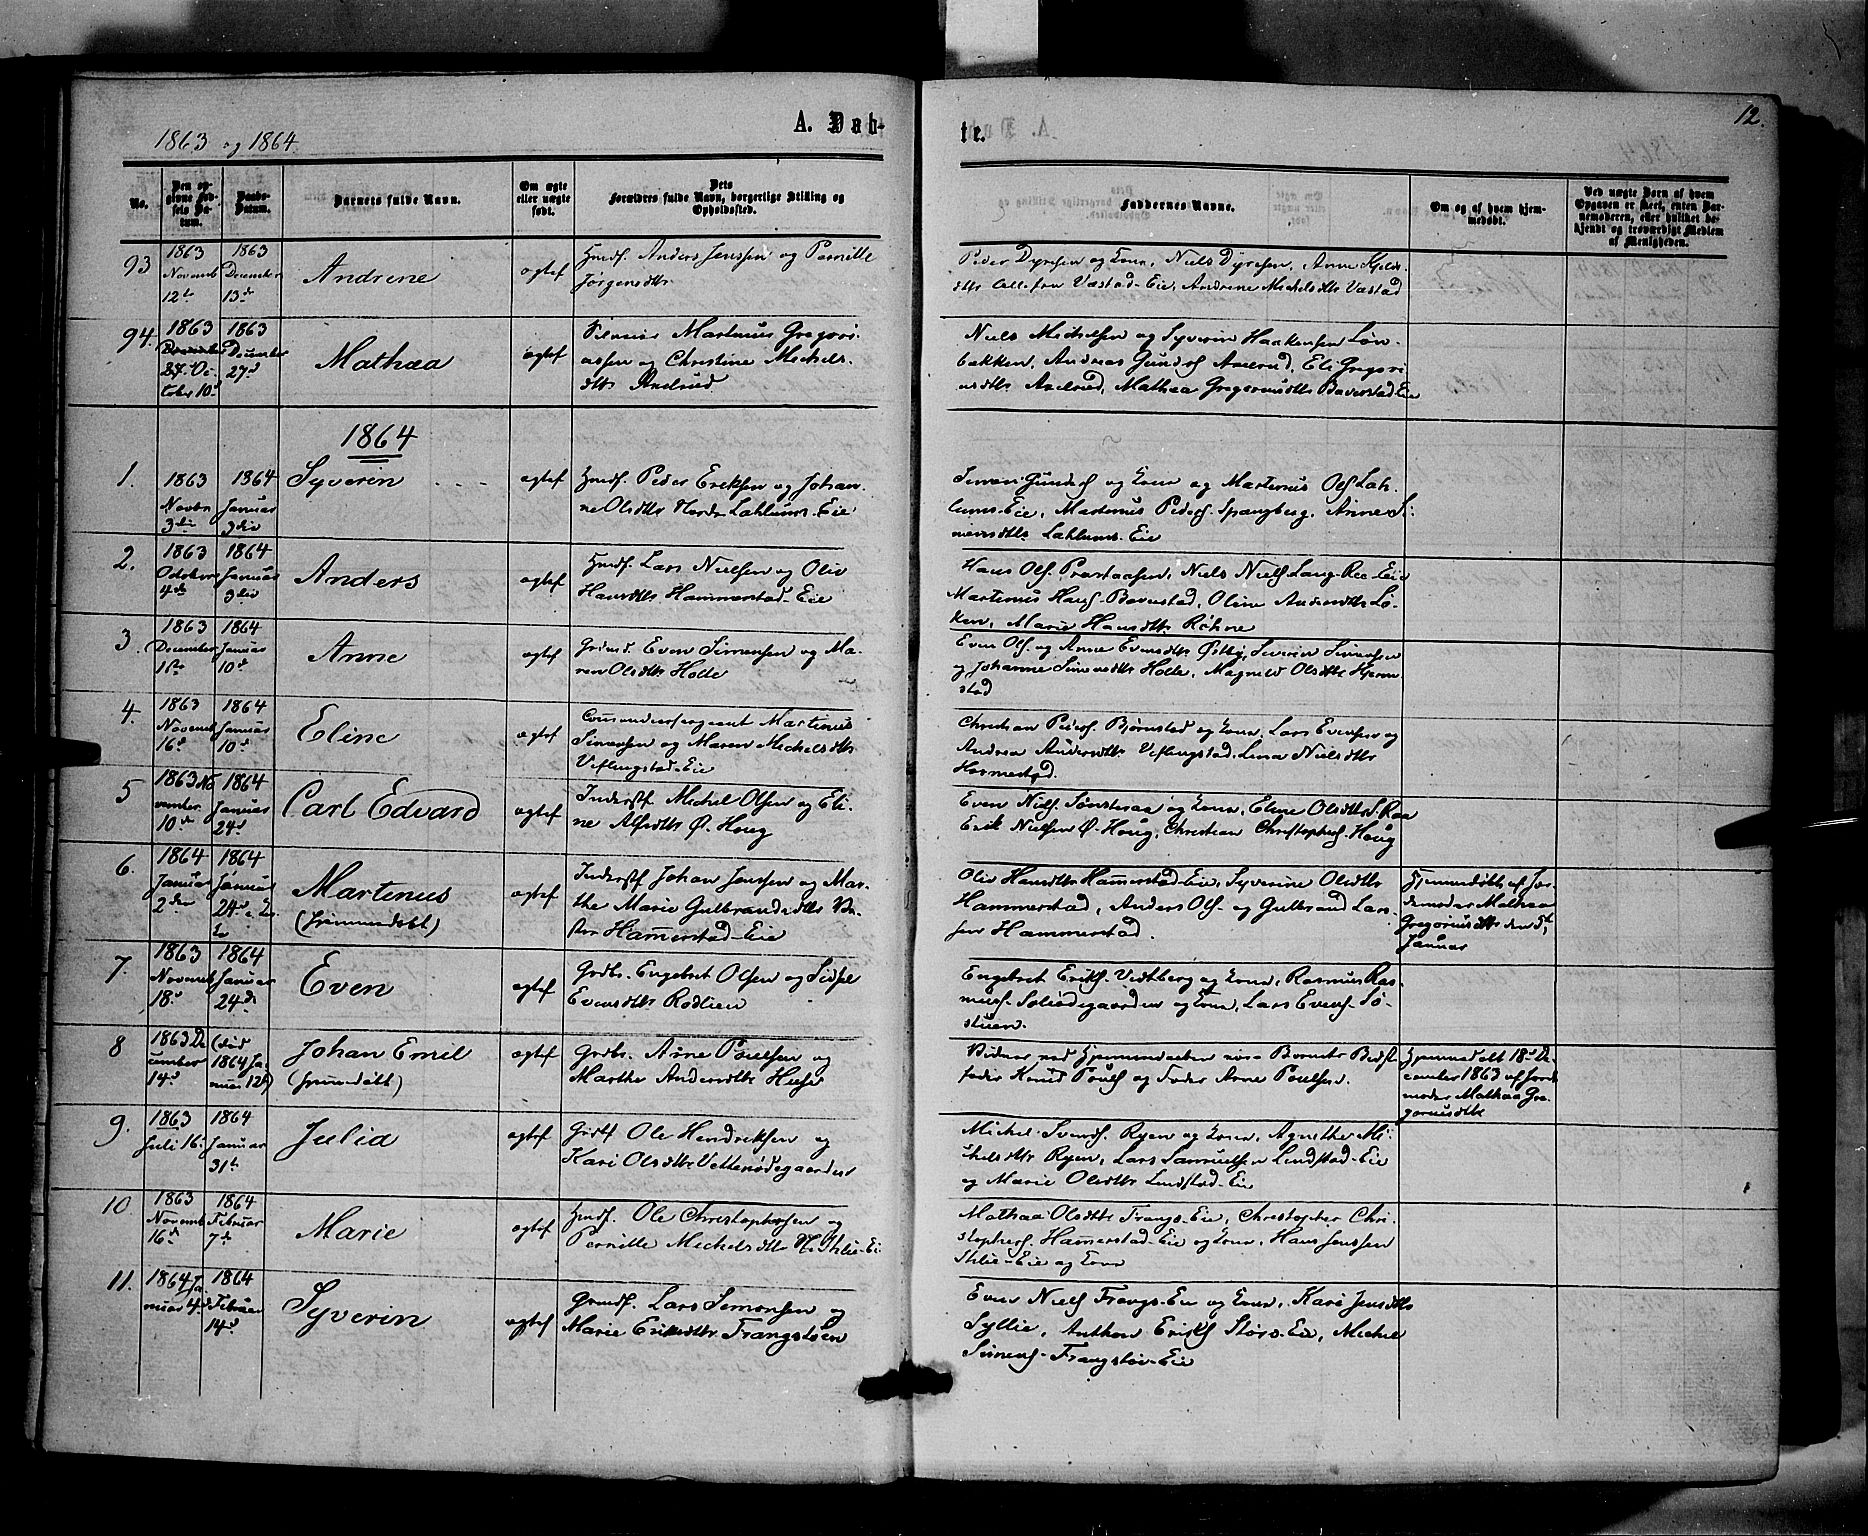 SAH, Stange prestekontor, K/L0013: Ministerialbok nr. 13, 1862-1879, s. 12